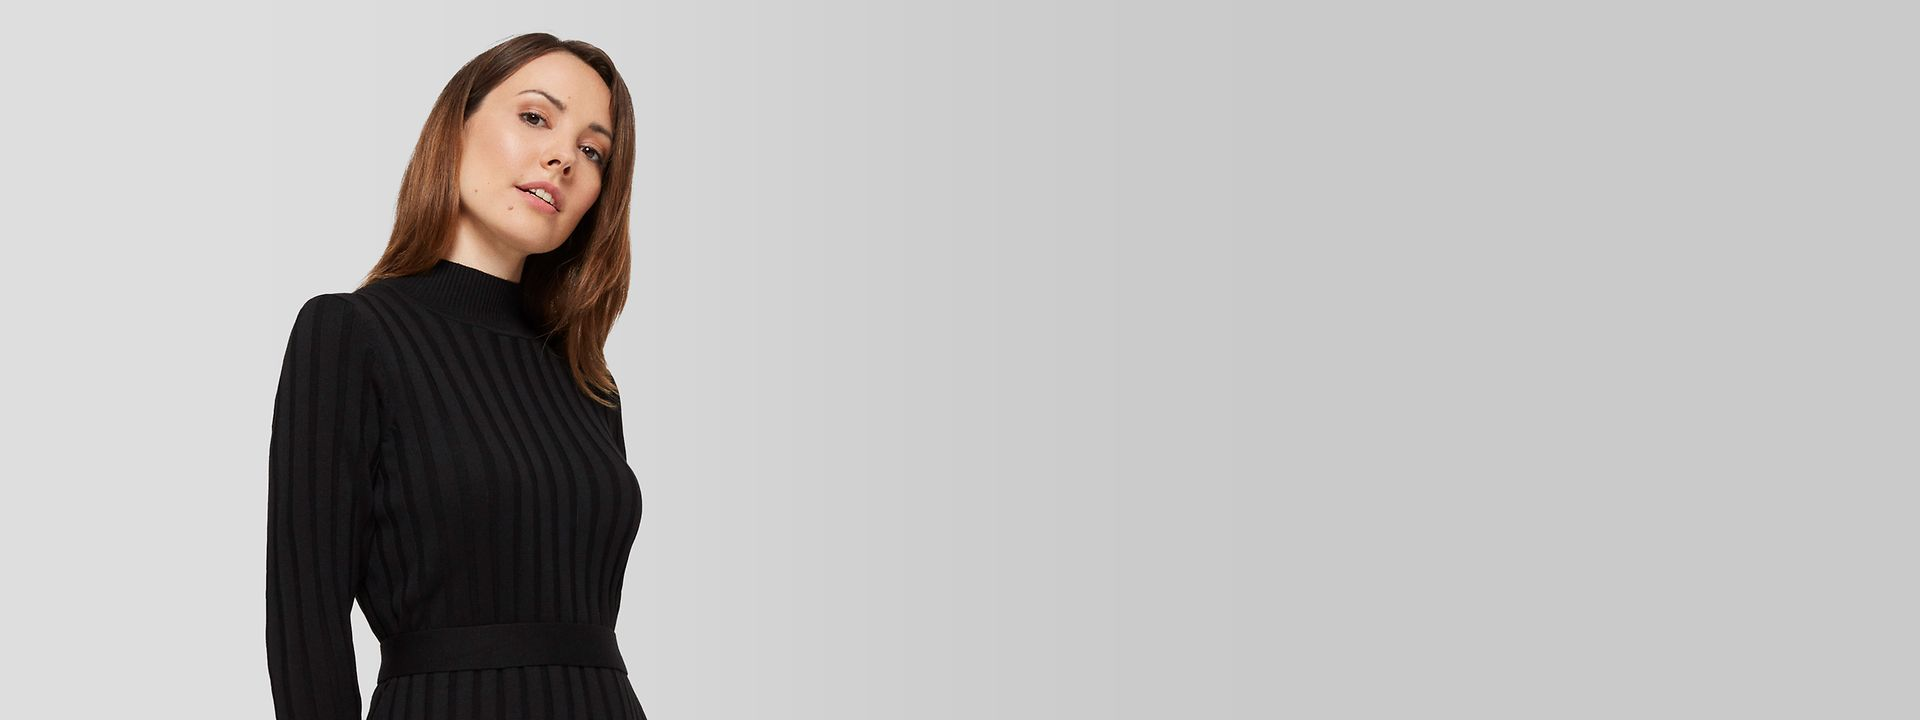 423021 - women - startpage - hero medium - live shopping - sustainability - IMG